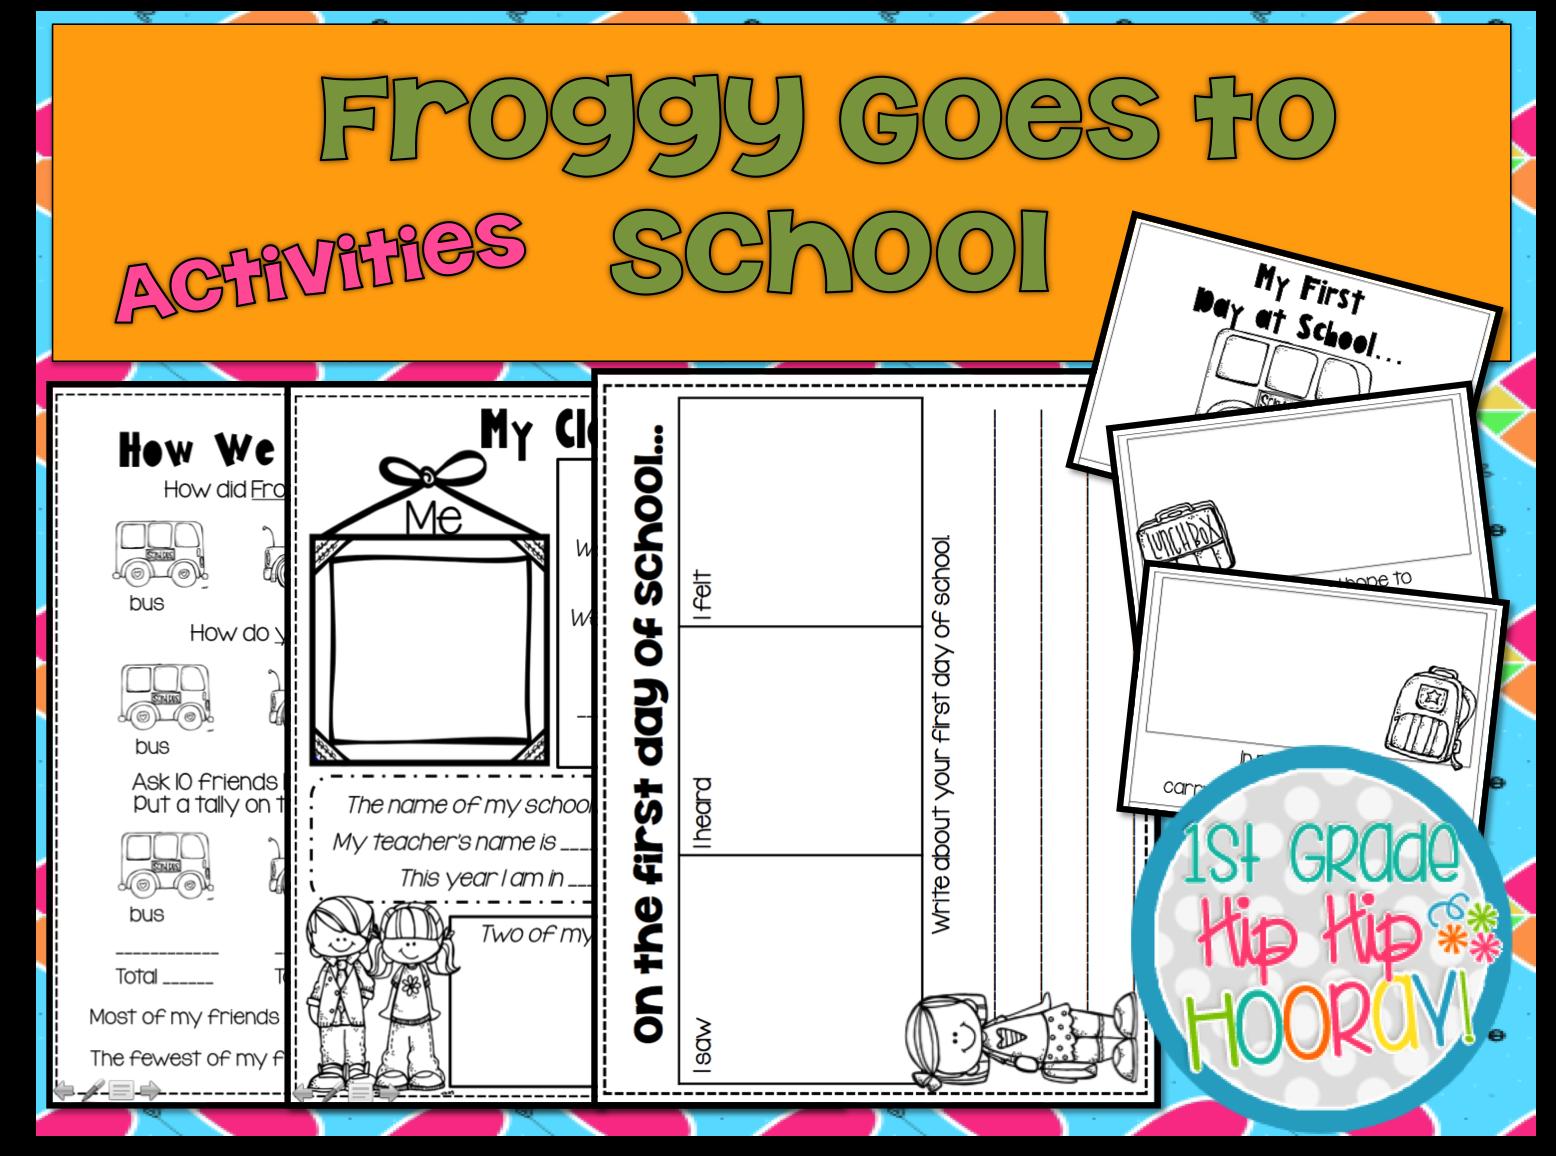 Froggy Goes To School Activities | Sites Education - Froggy Goes To School Free Printables